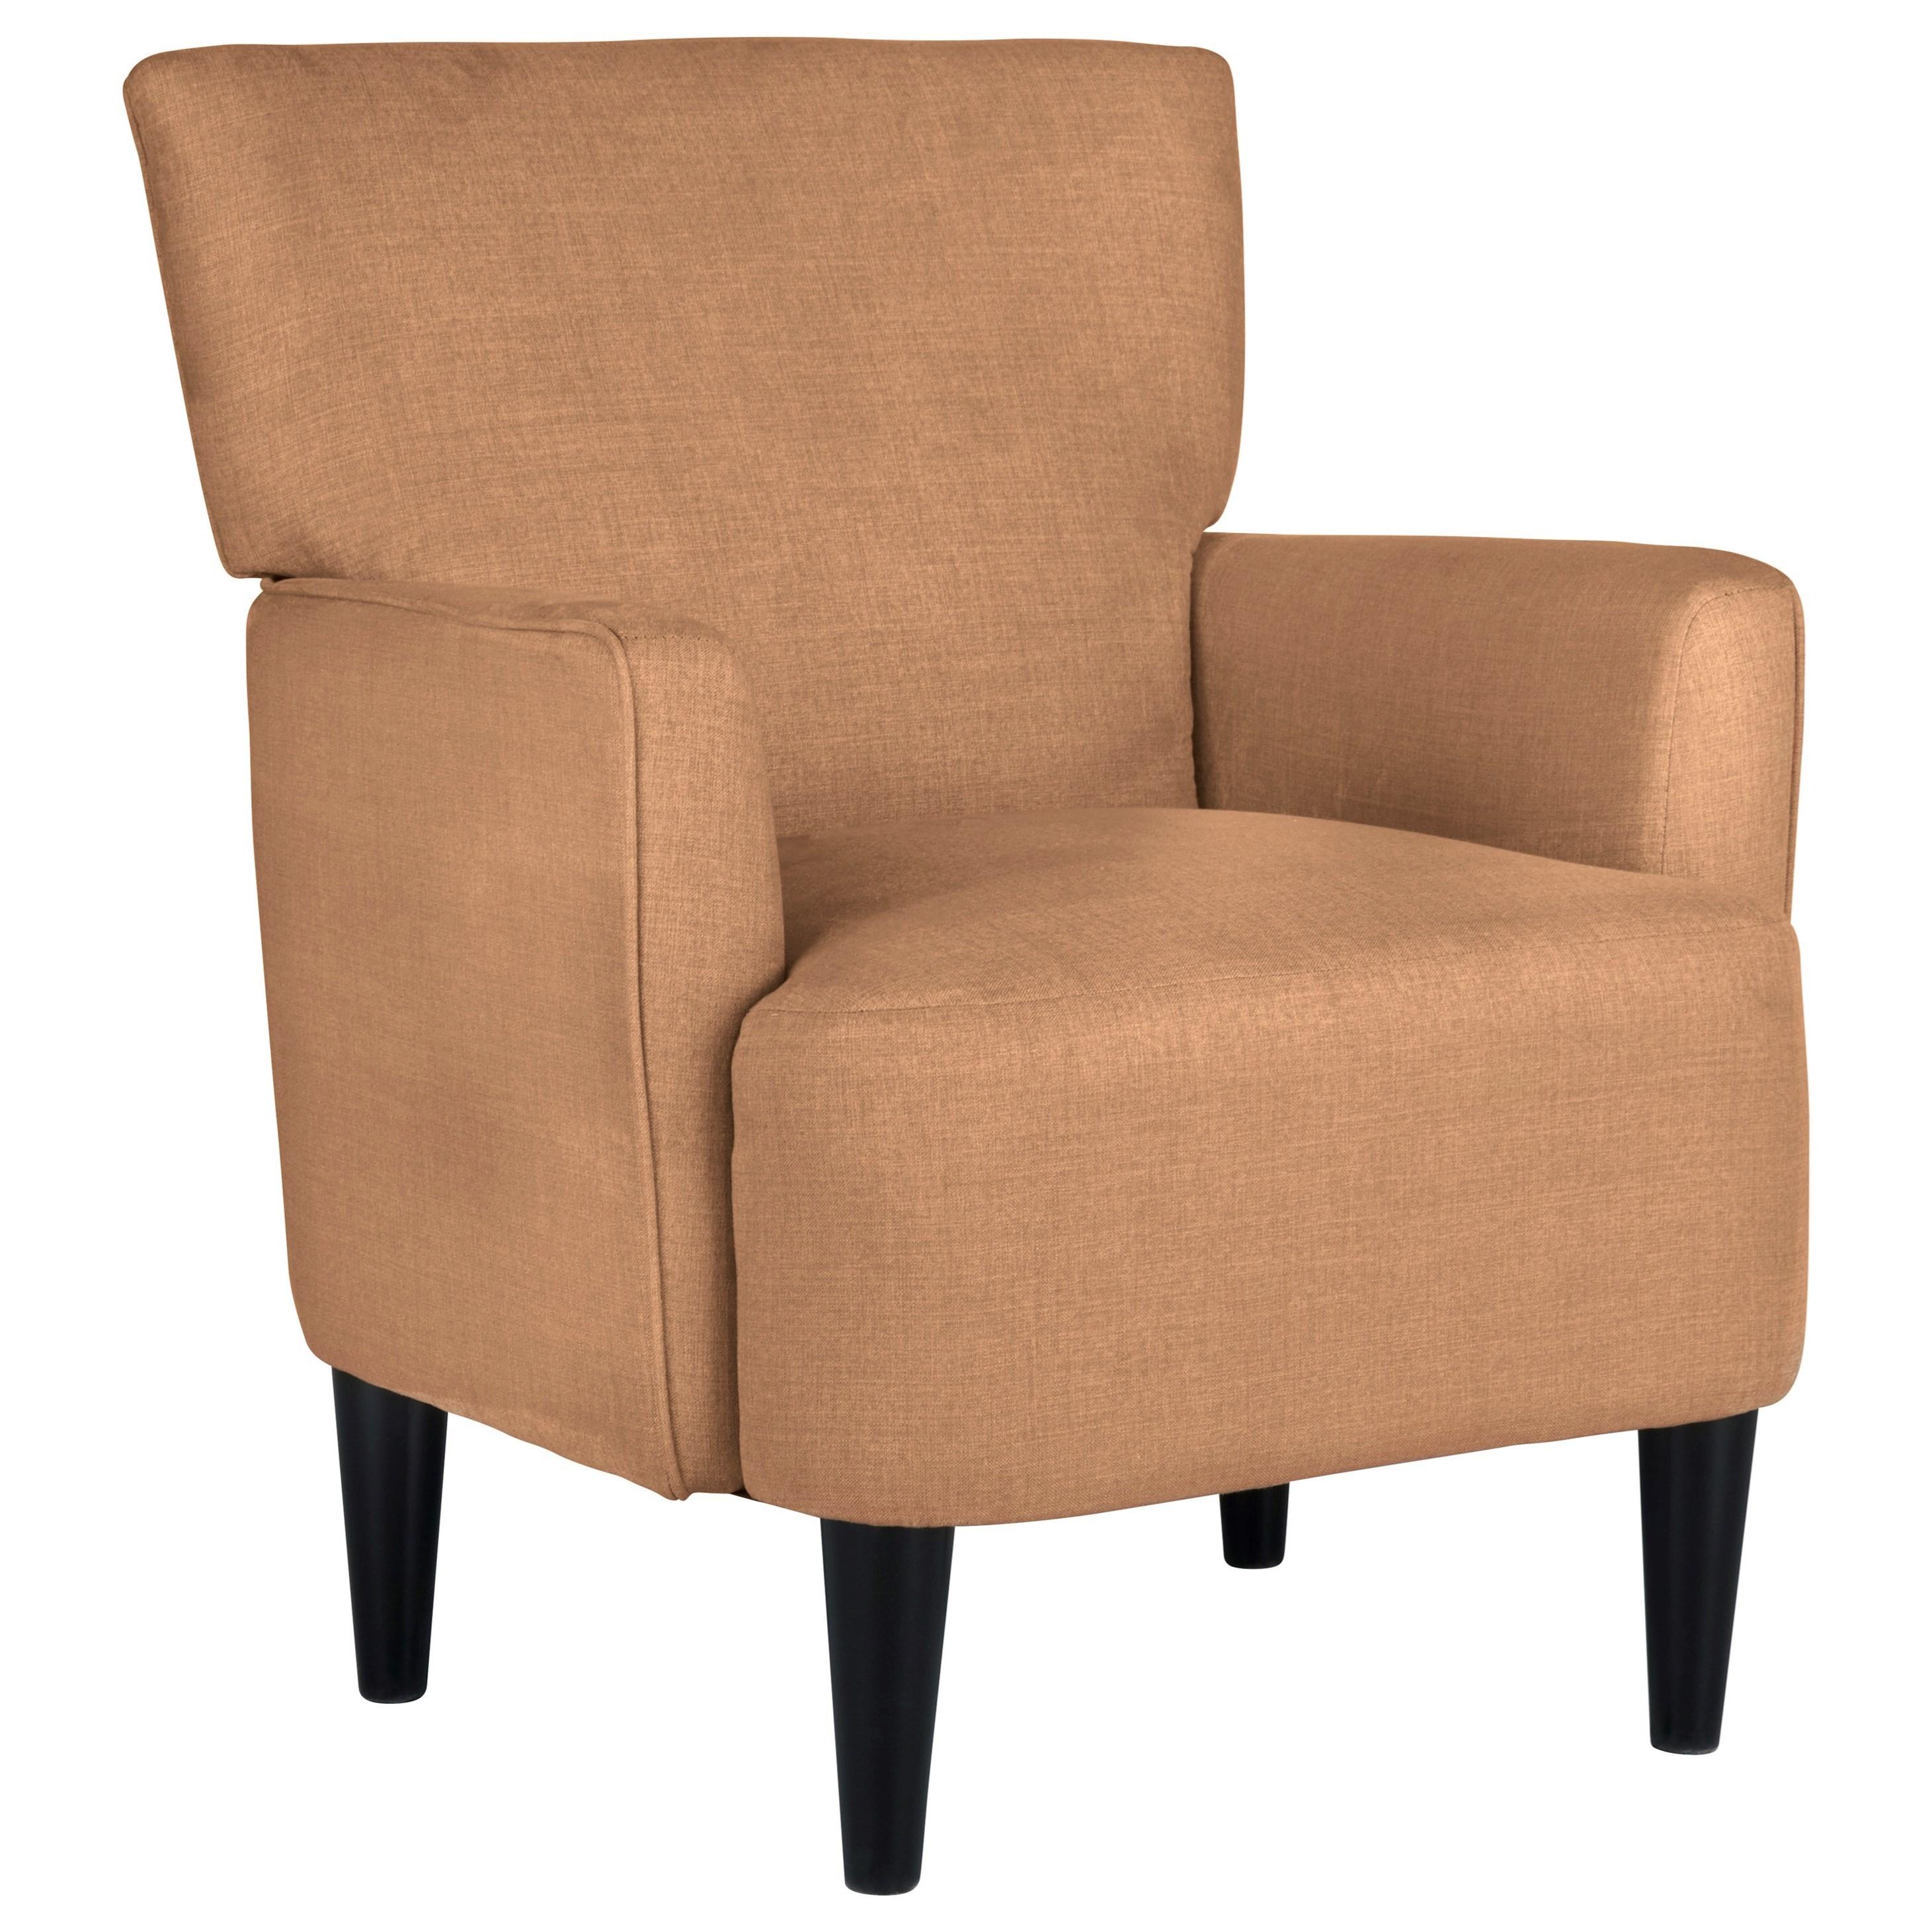 Hansridge Accent Chair by Ashley (Signature Design) at Johnny Janosik